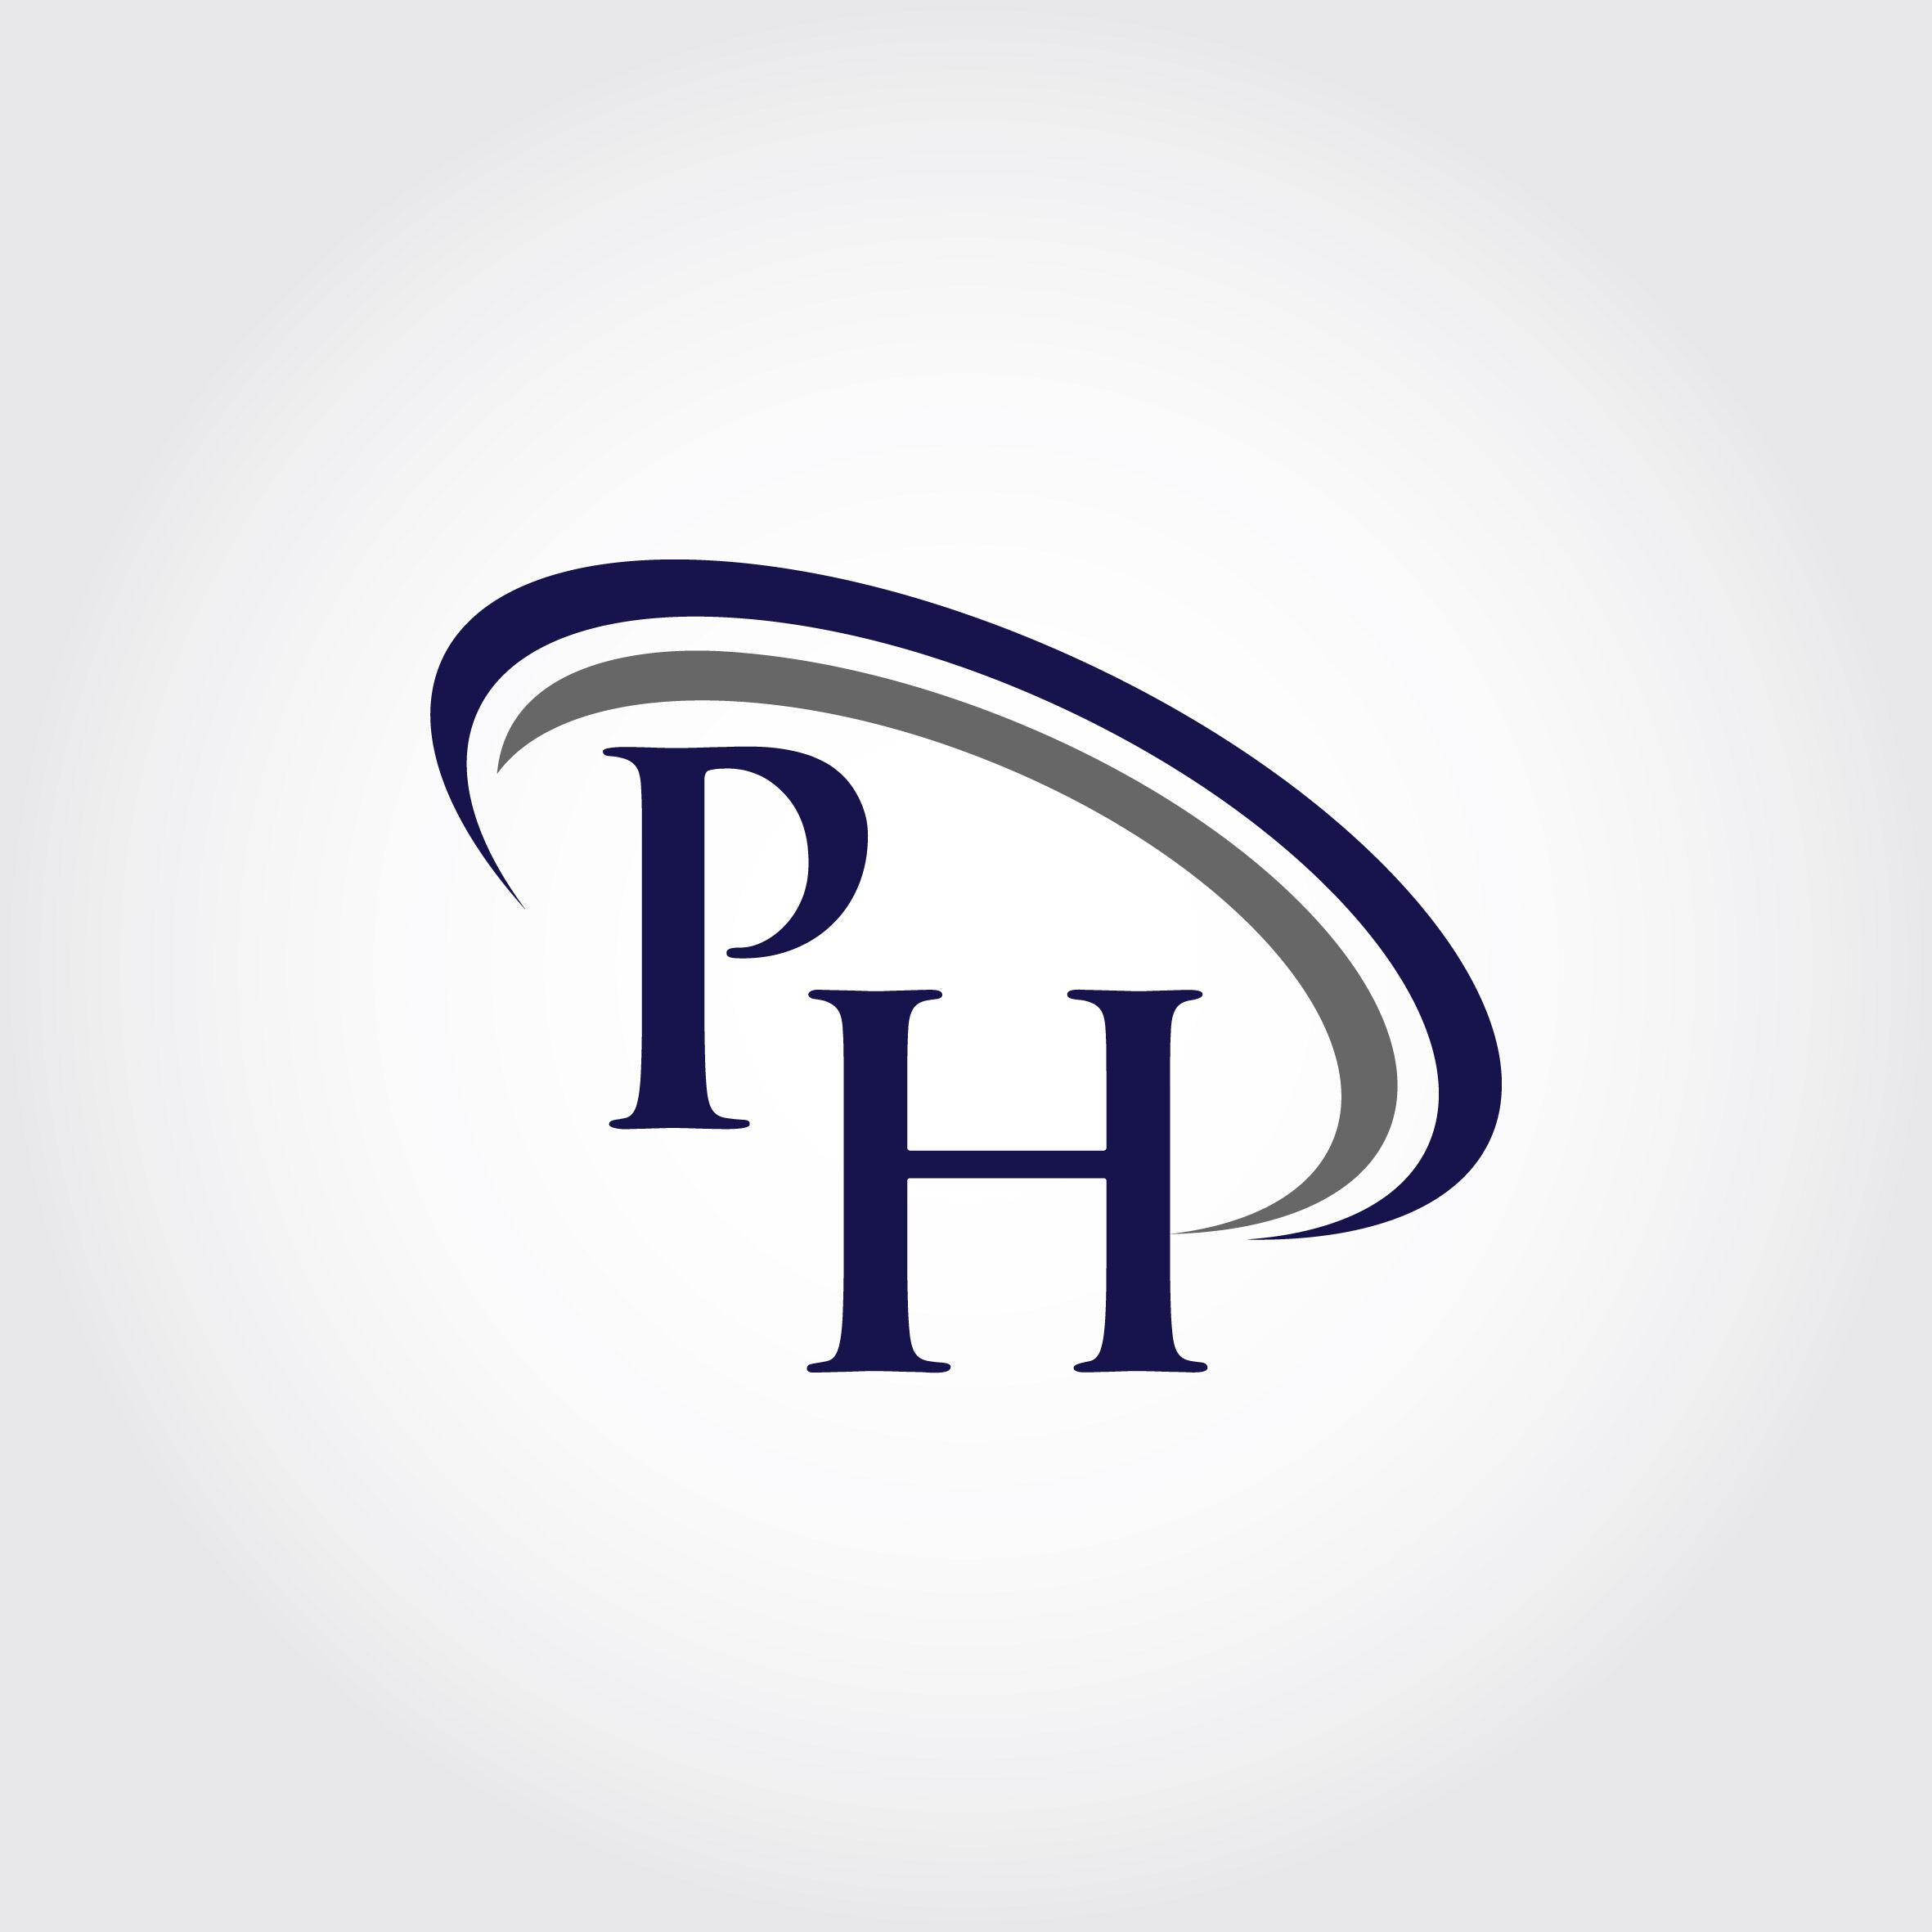 Monogram Ph Logo Design By Vectorseller Thehungryjpeg Com